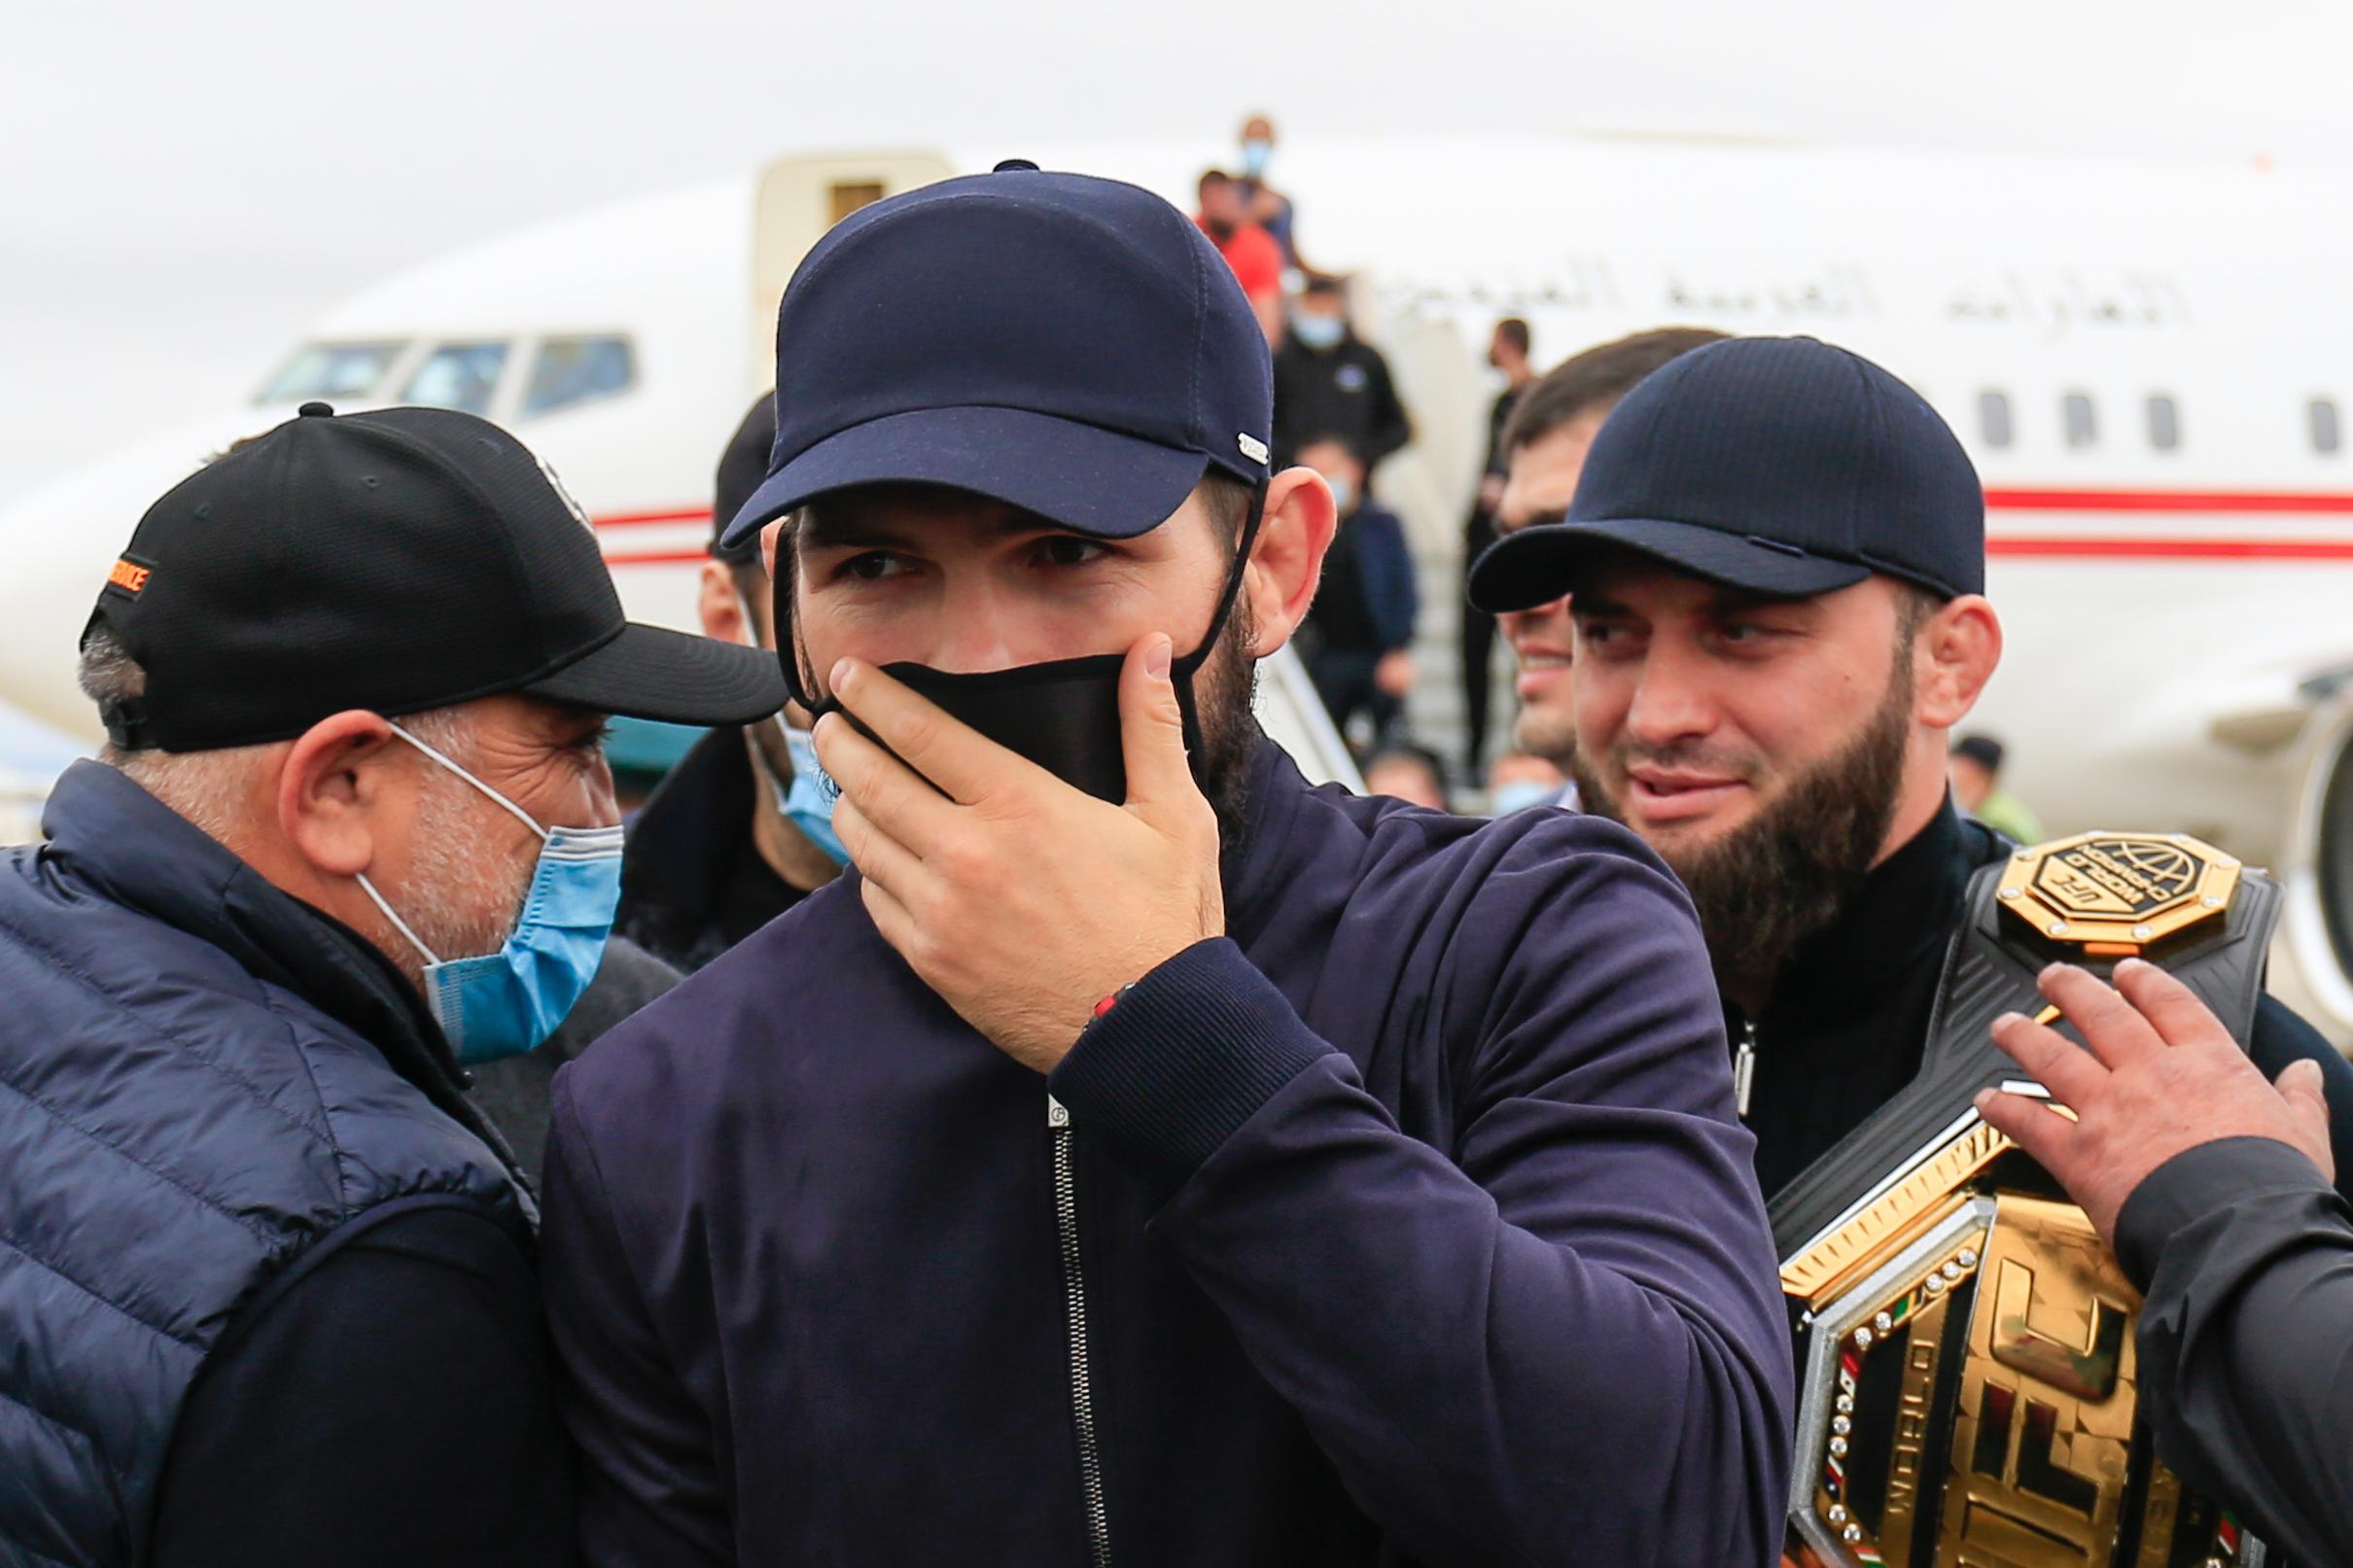 UFC Lightweight Champion Khabib Nurmagomedov is welcomed at a city airport